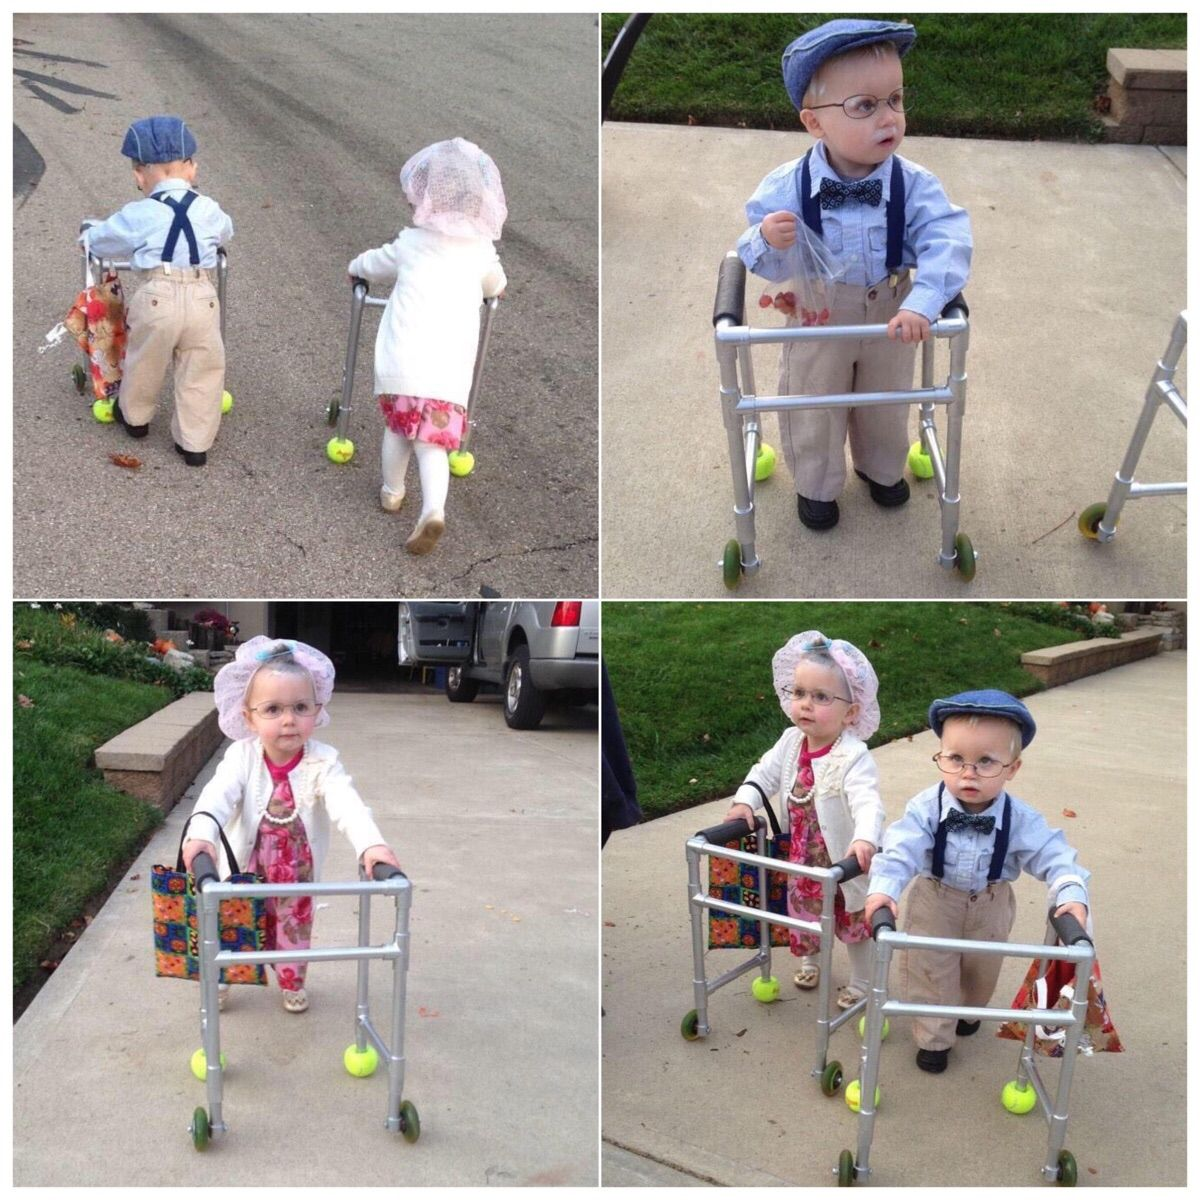 explore twins halloween costumes twin halloween and more - Baby Twin Halloween Costumes